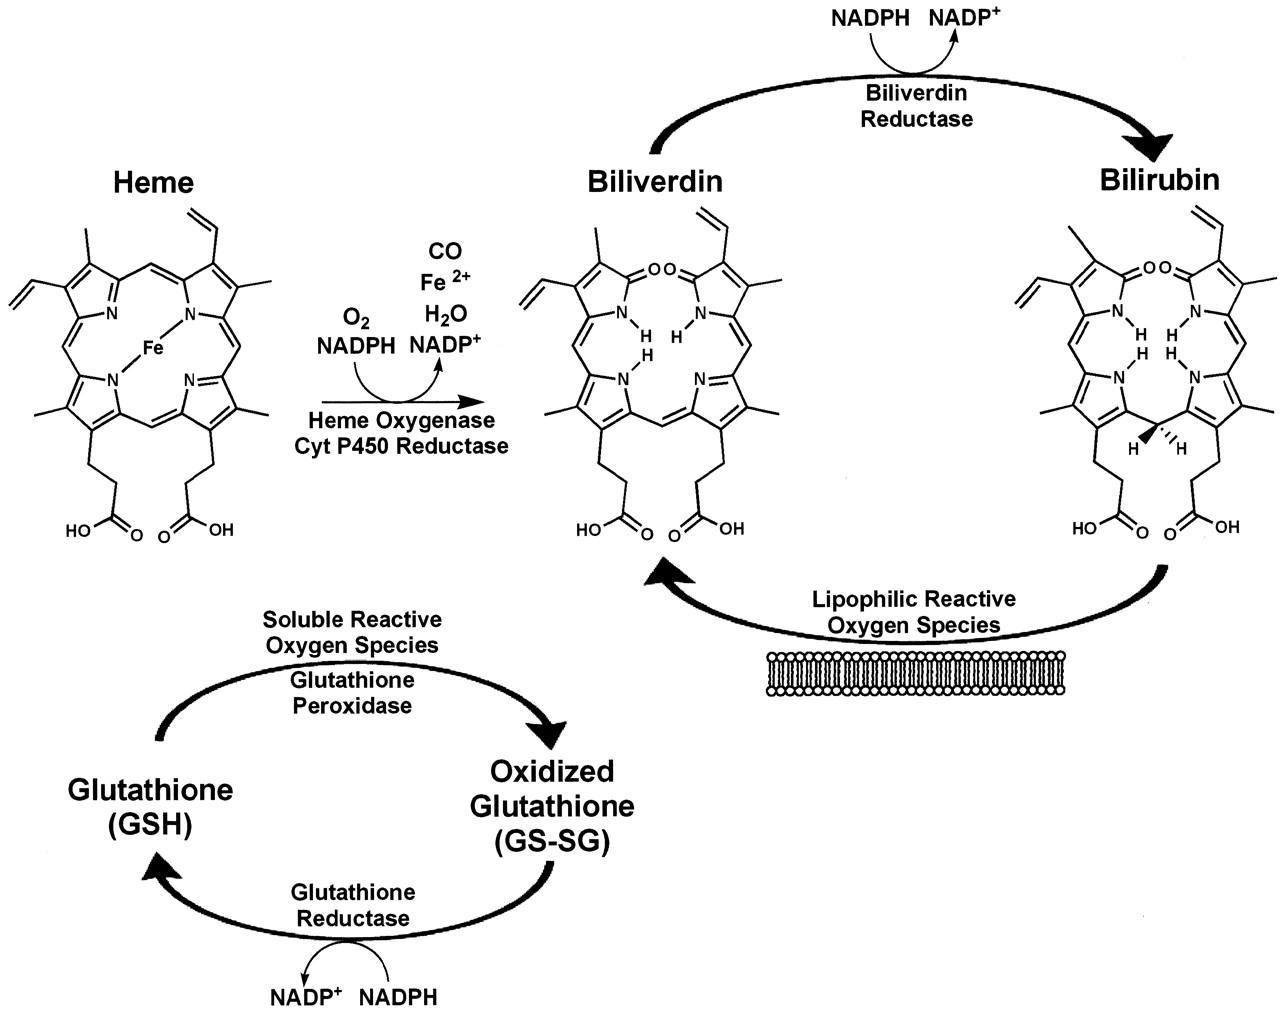 Glutathione Peroxidase 1 Activity and Cardiovascular